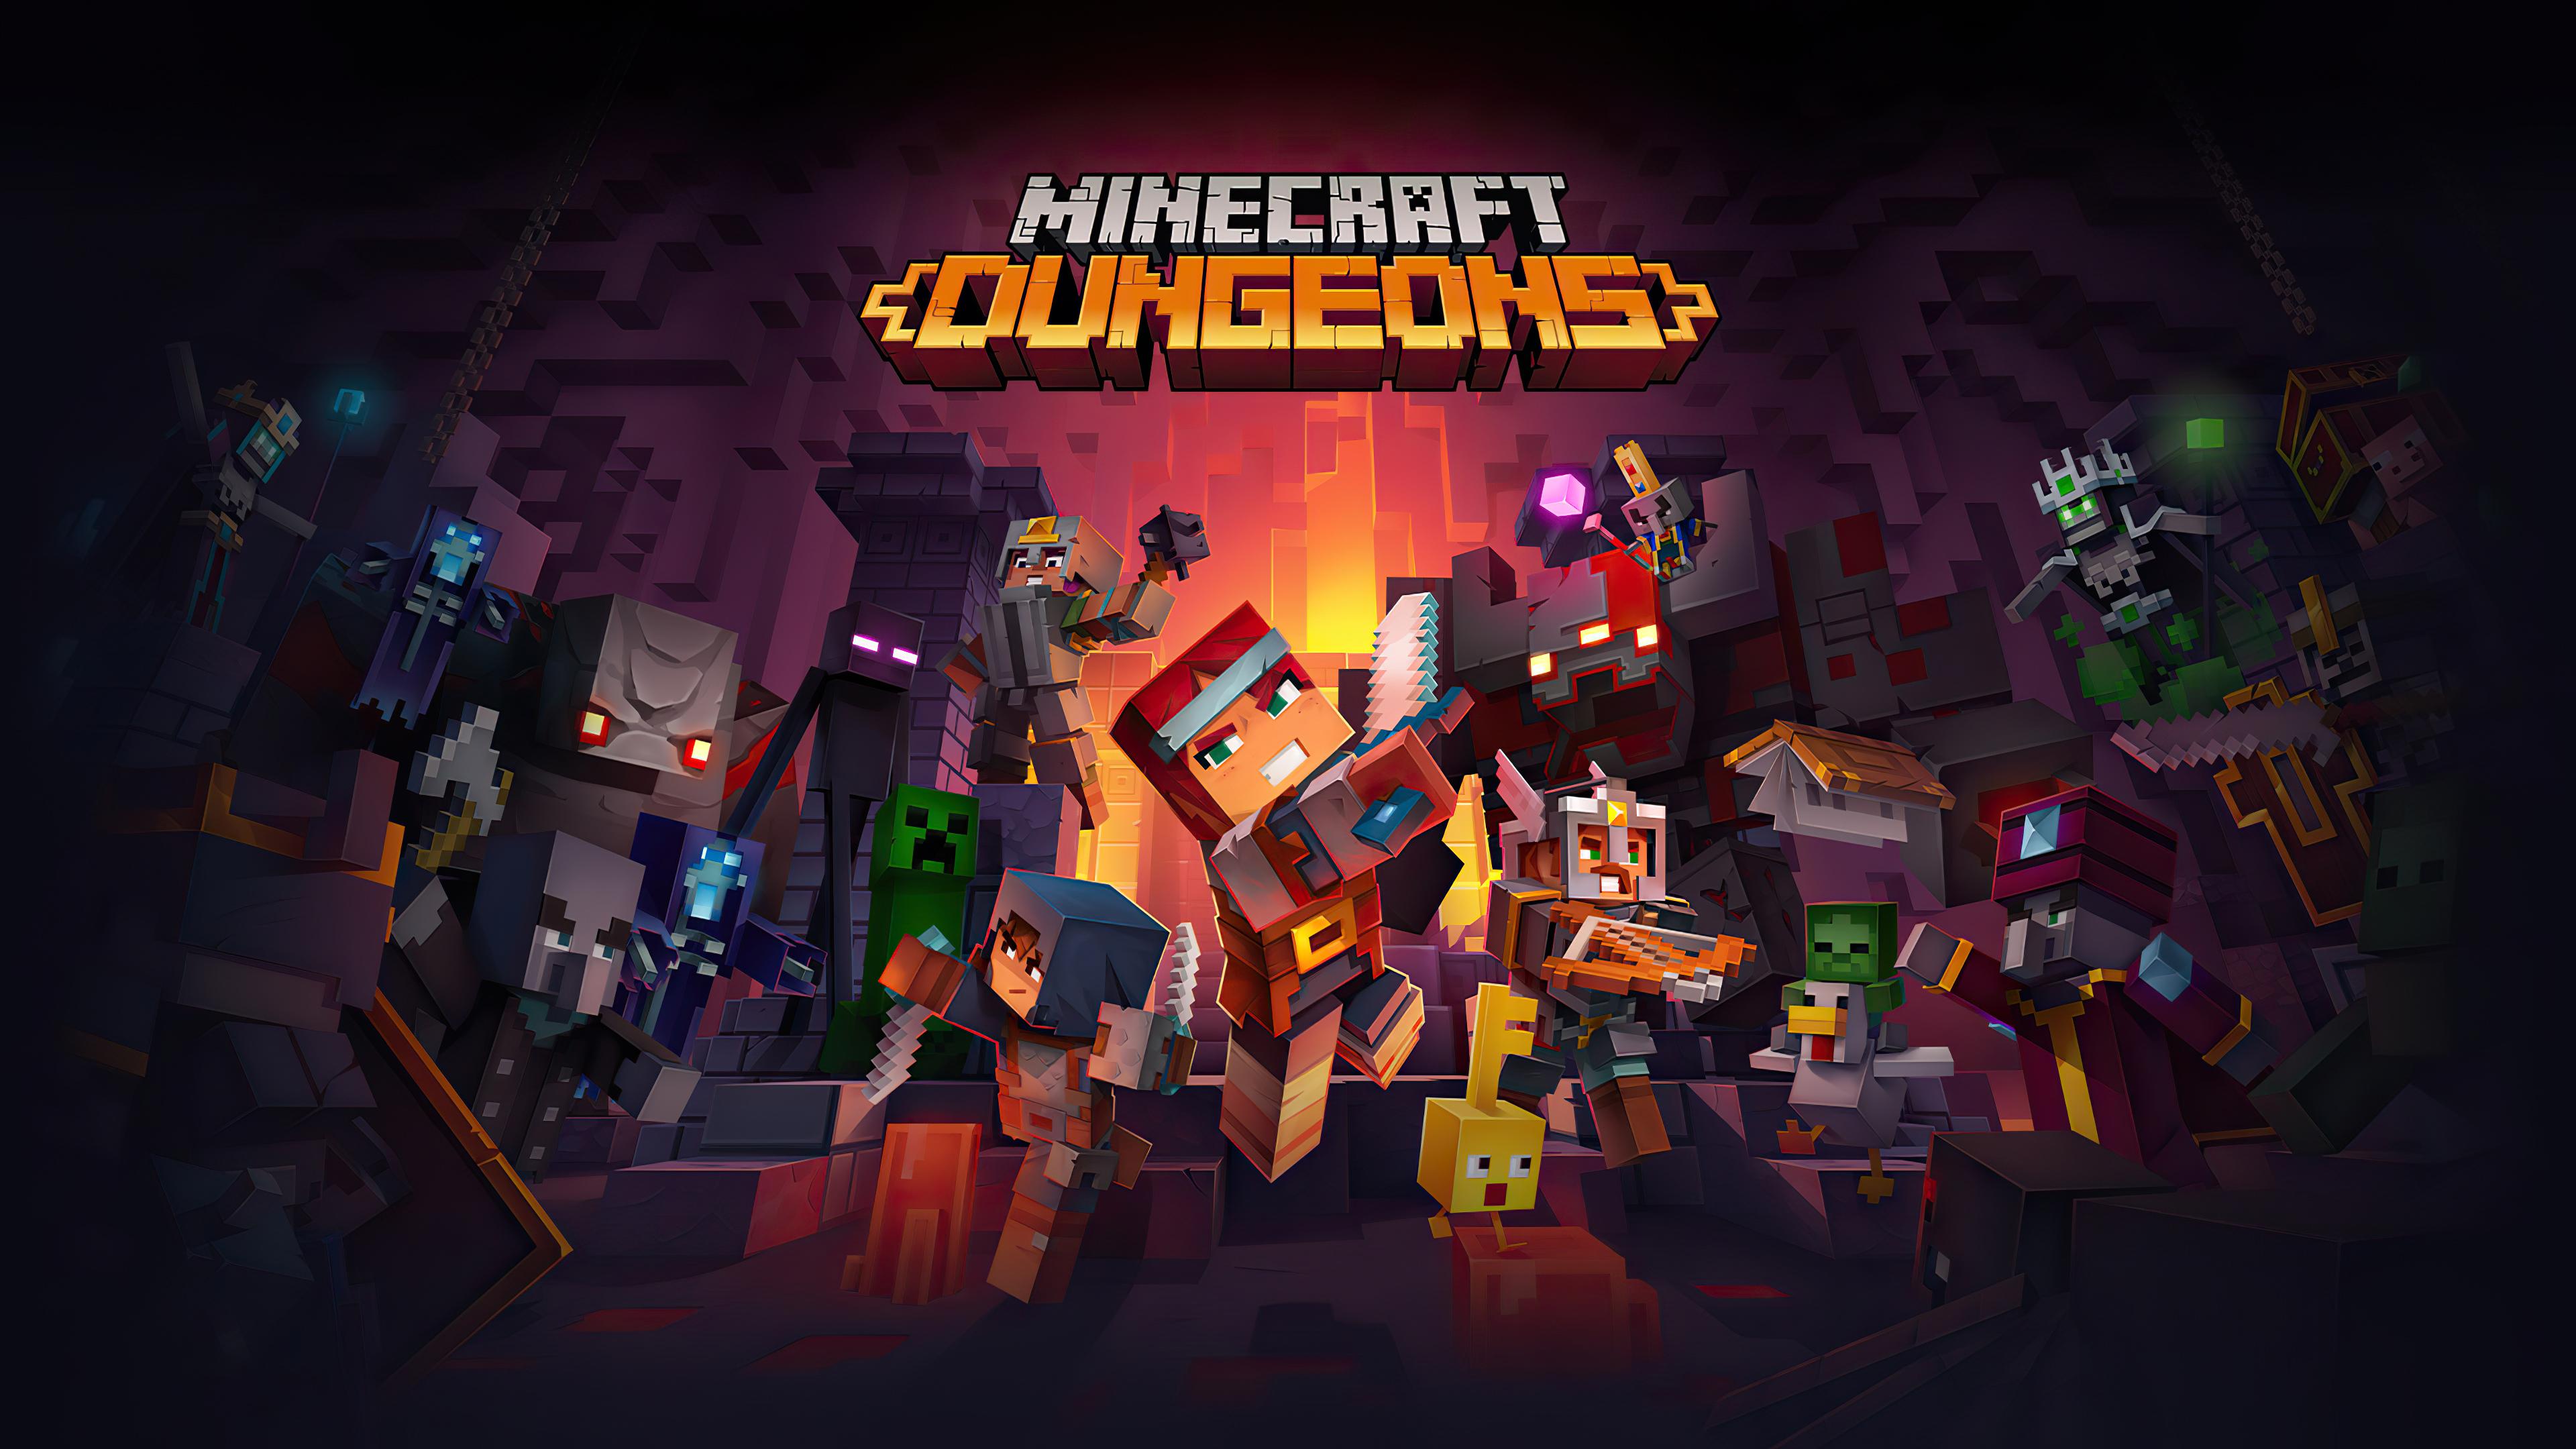 Fondos de pantalla Minecraft Dungeons